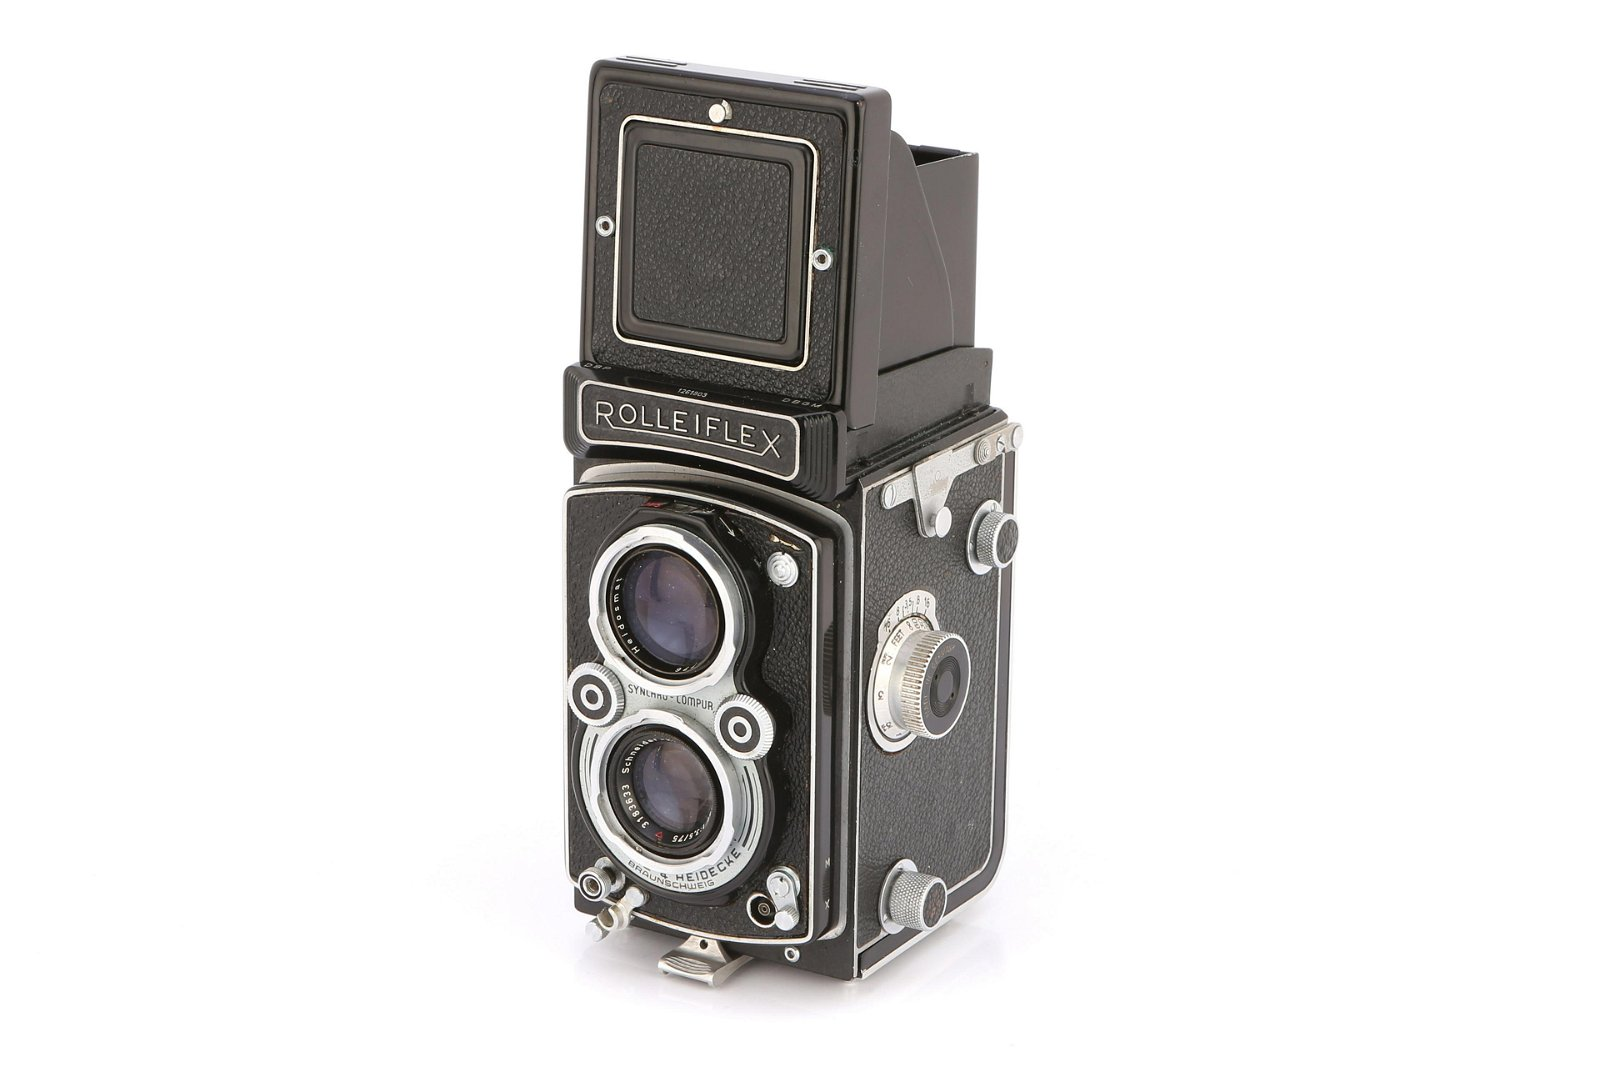 * A Rollei Rolleiflex Automat MX TLR Camera,